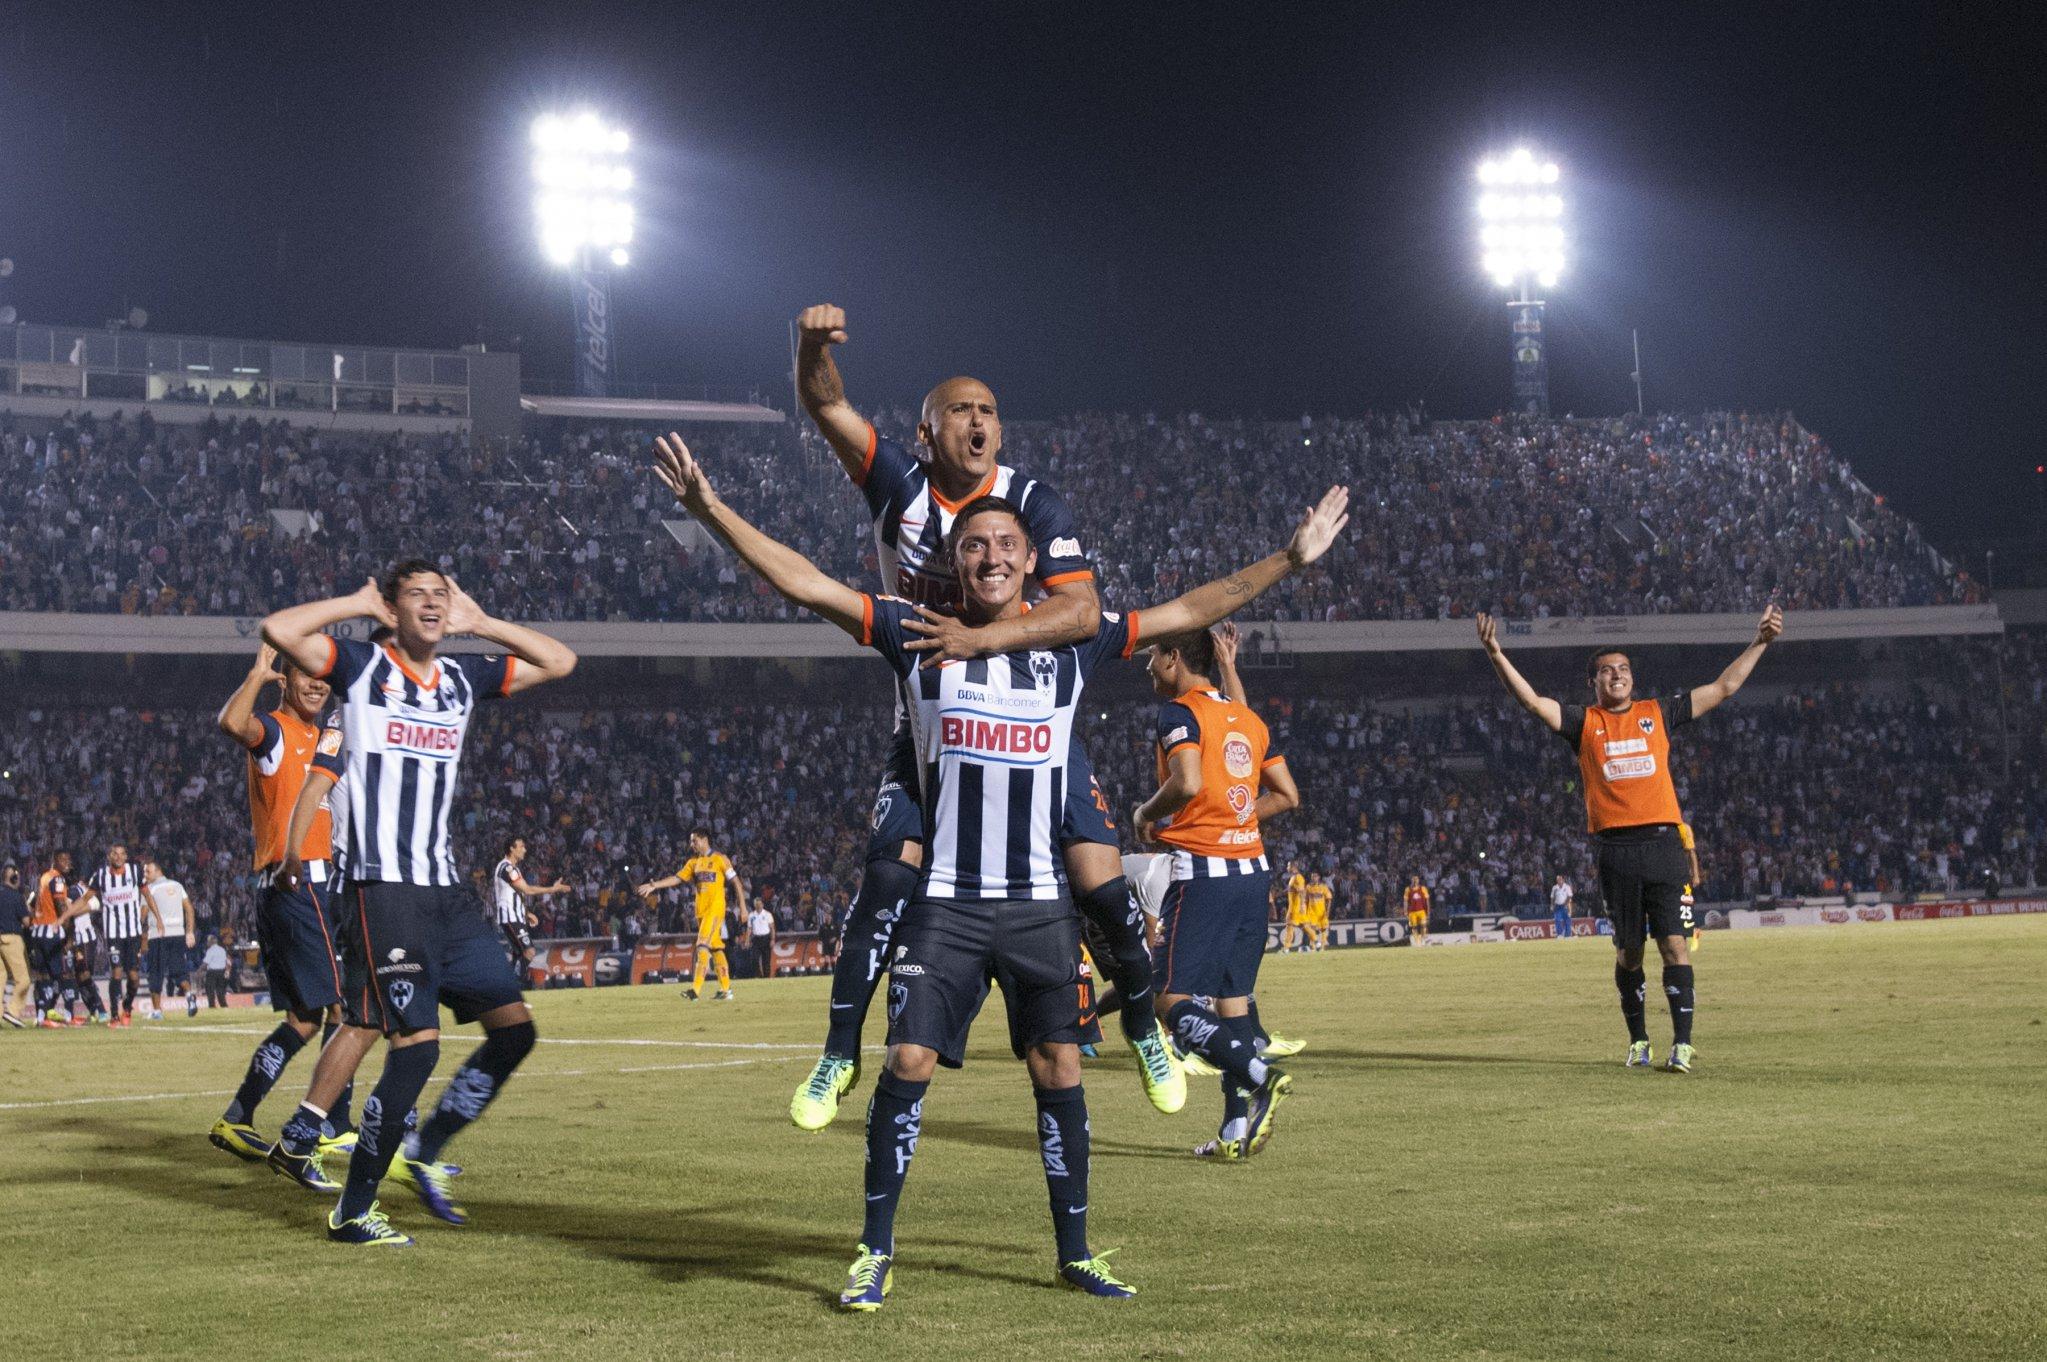 Photo by Liga MX